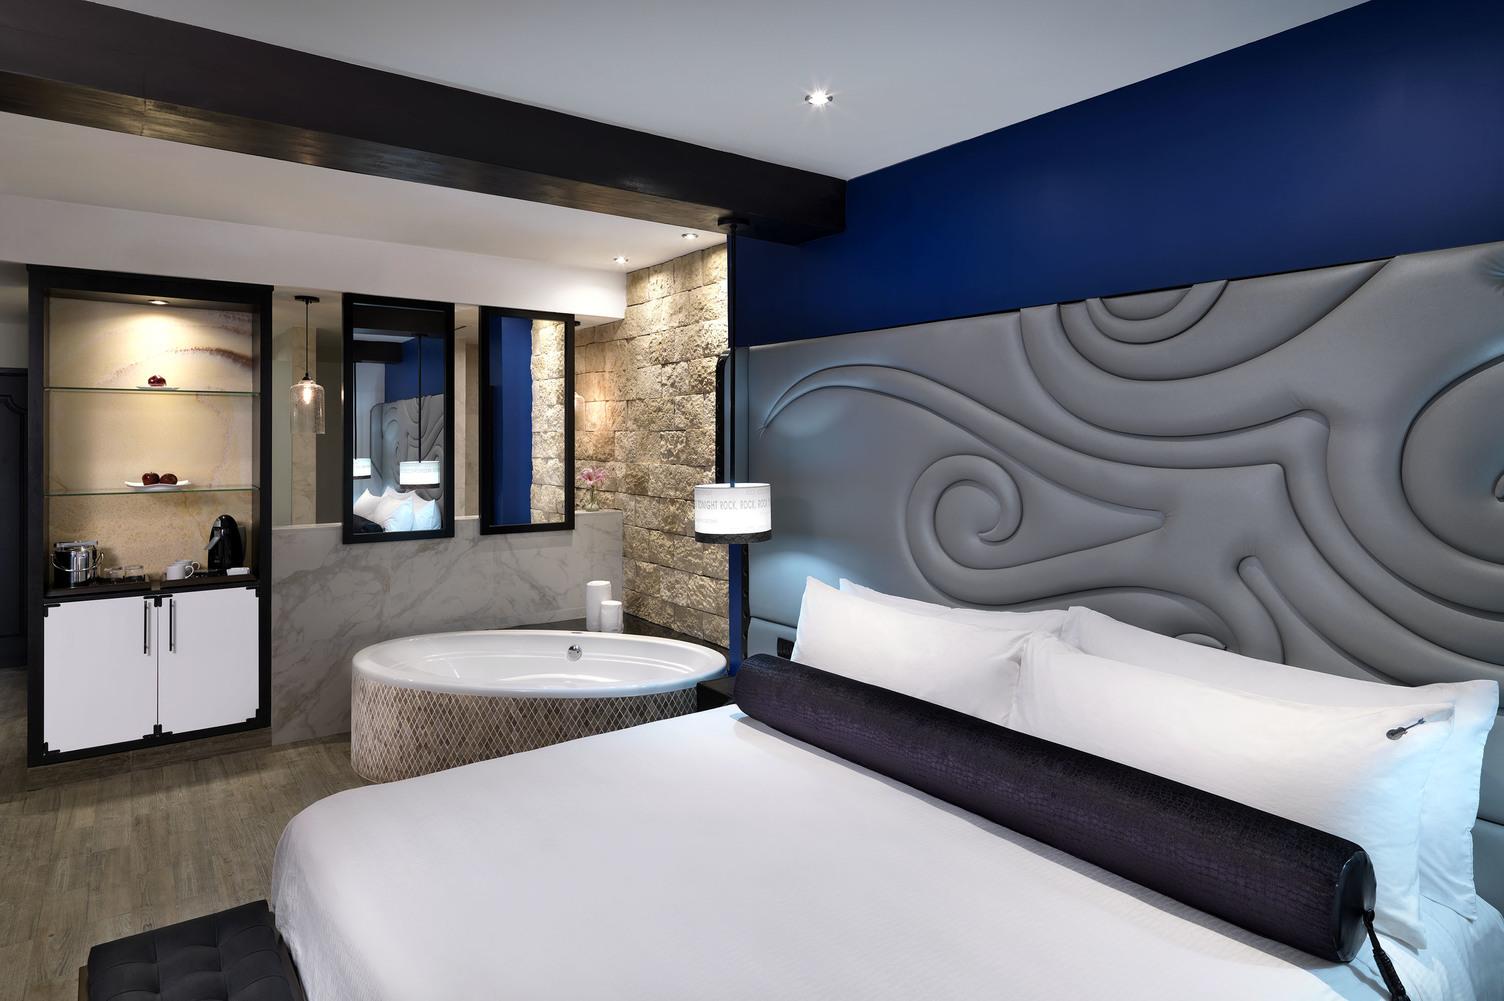 Travel Agency All-Inclusive Resort Heaven at Hard Rock Hotel Riviera Maya 36